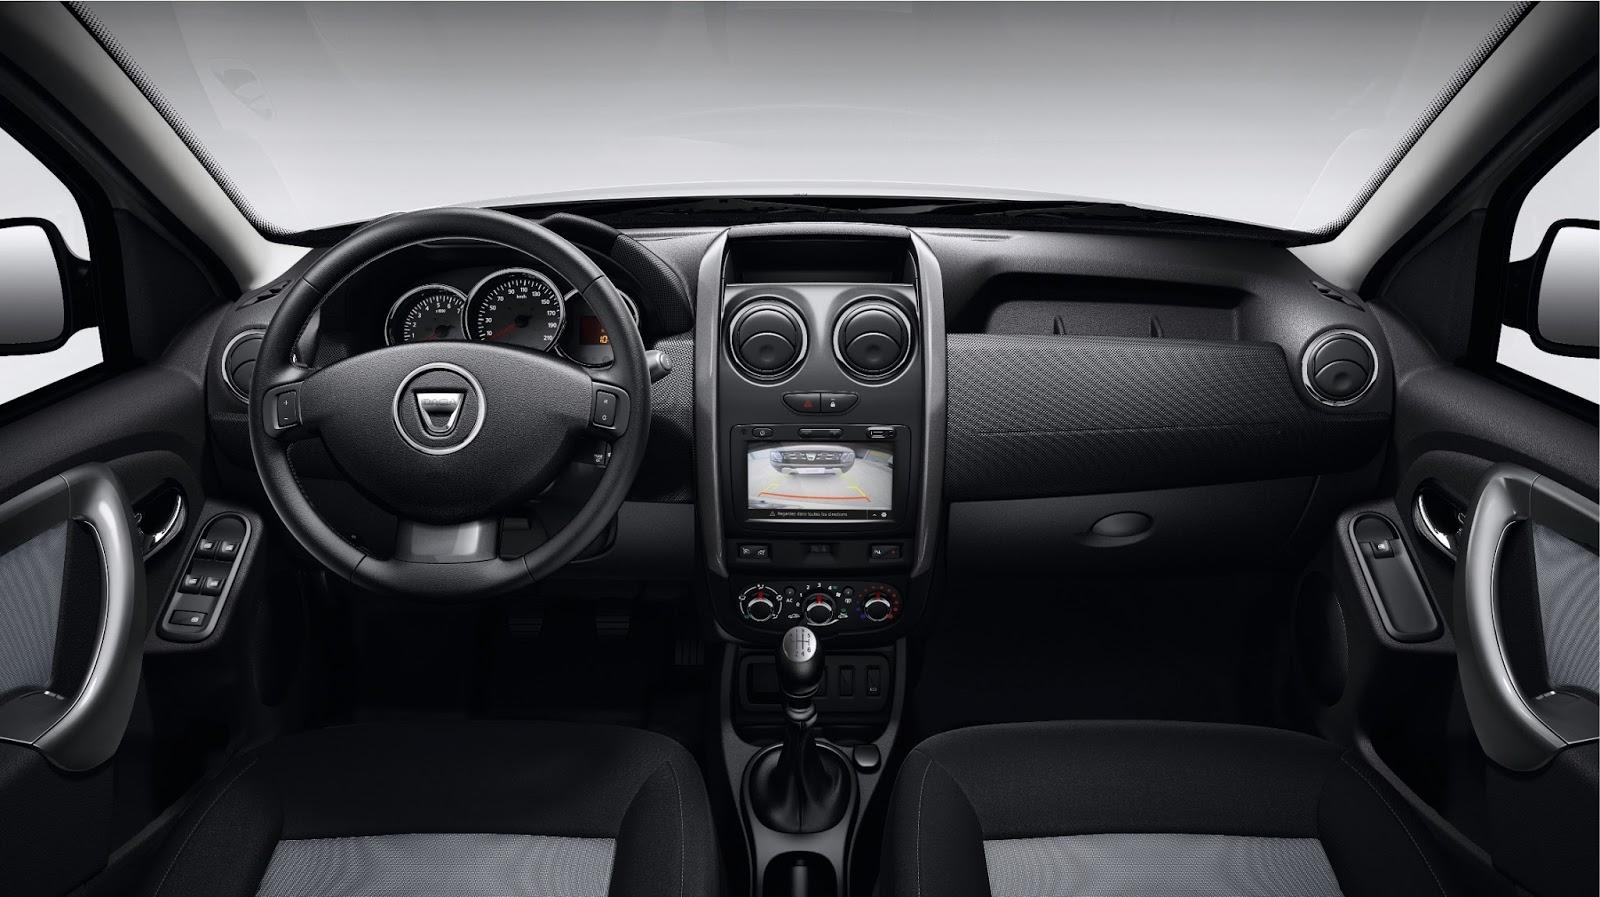 00086991 l DACIA Duster: Το σκληροτράχηλο Crossover! compact SUV, Dacia, Dacia Duster, Duster